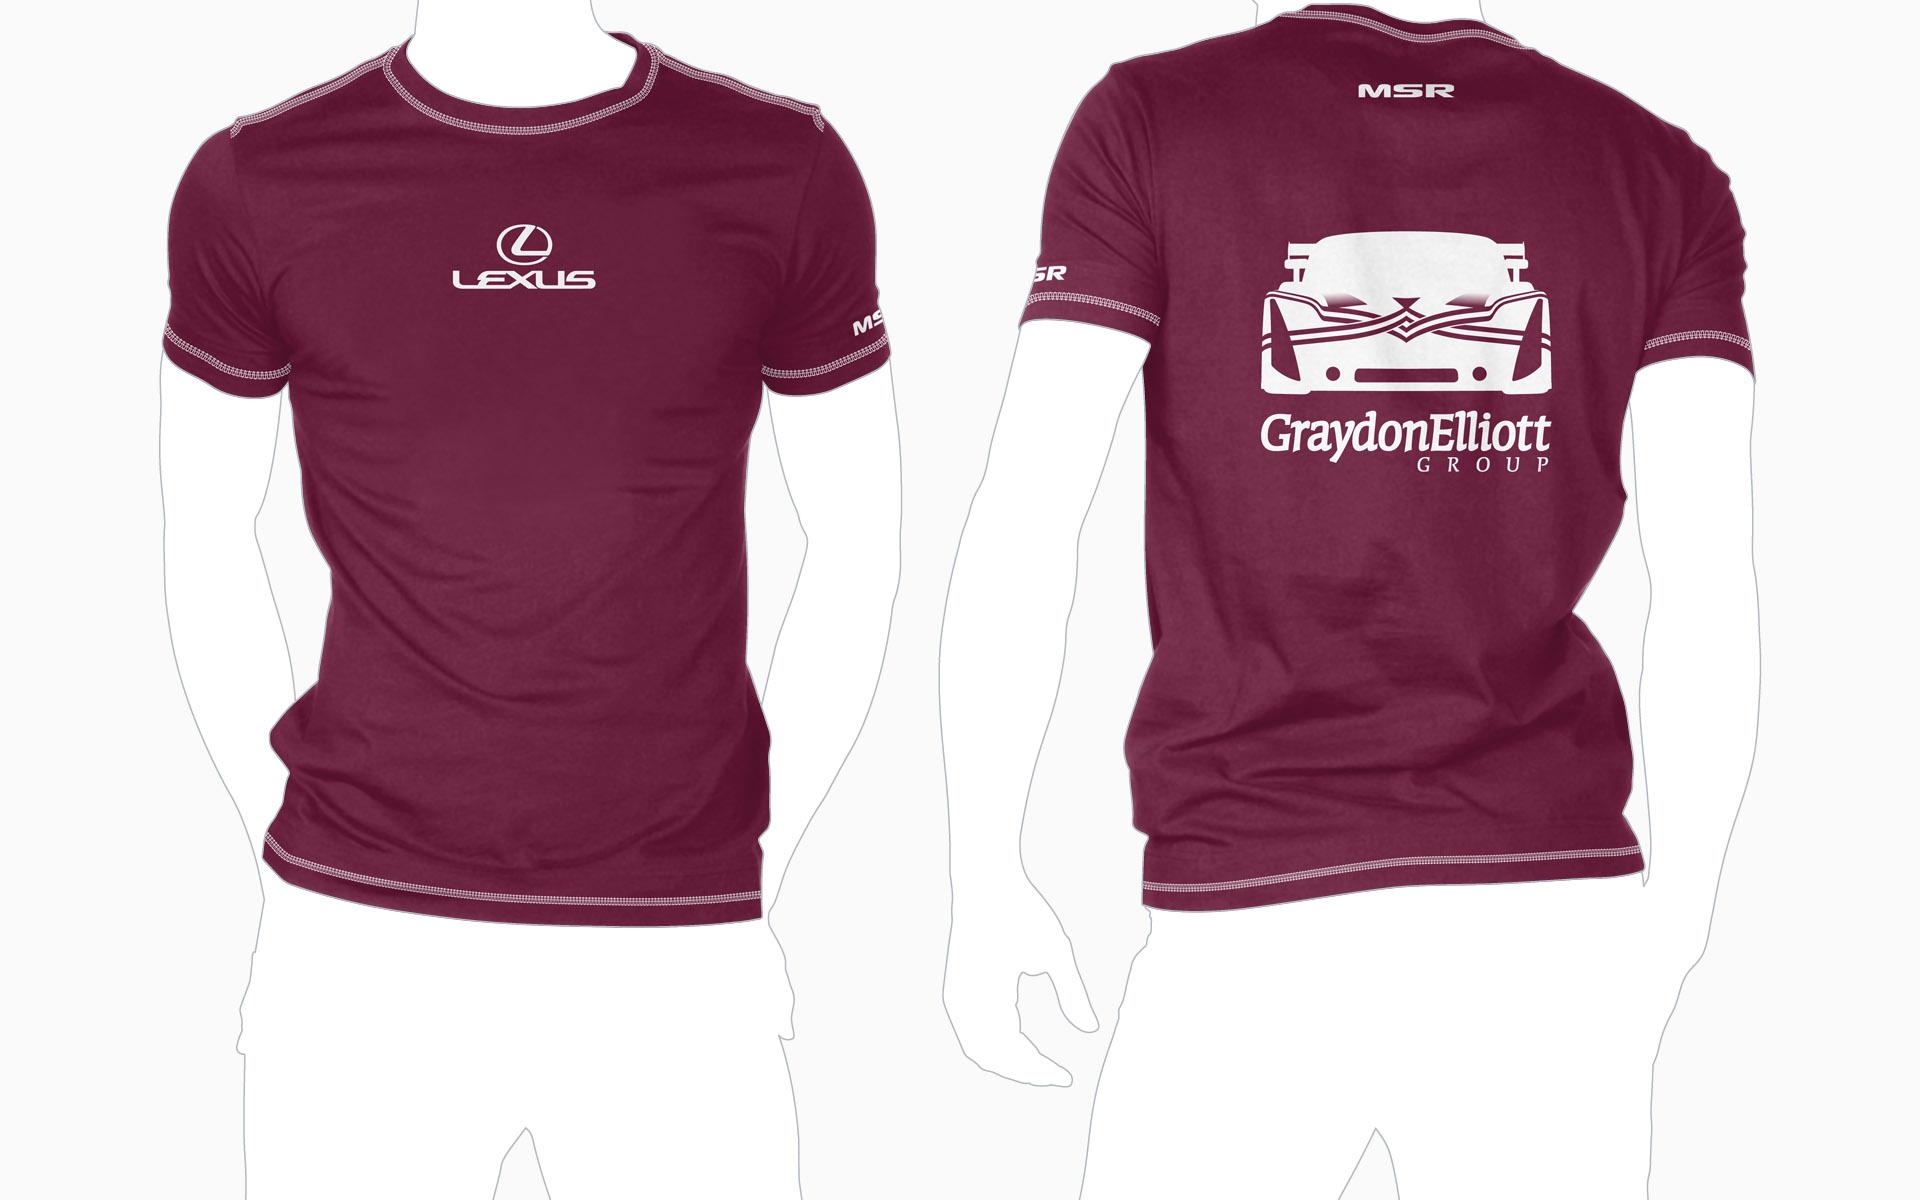 Michael Shank Racing Graydon Elliott T-Shirt